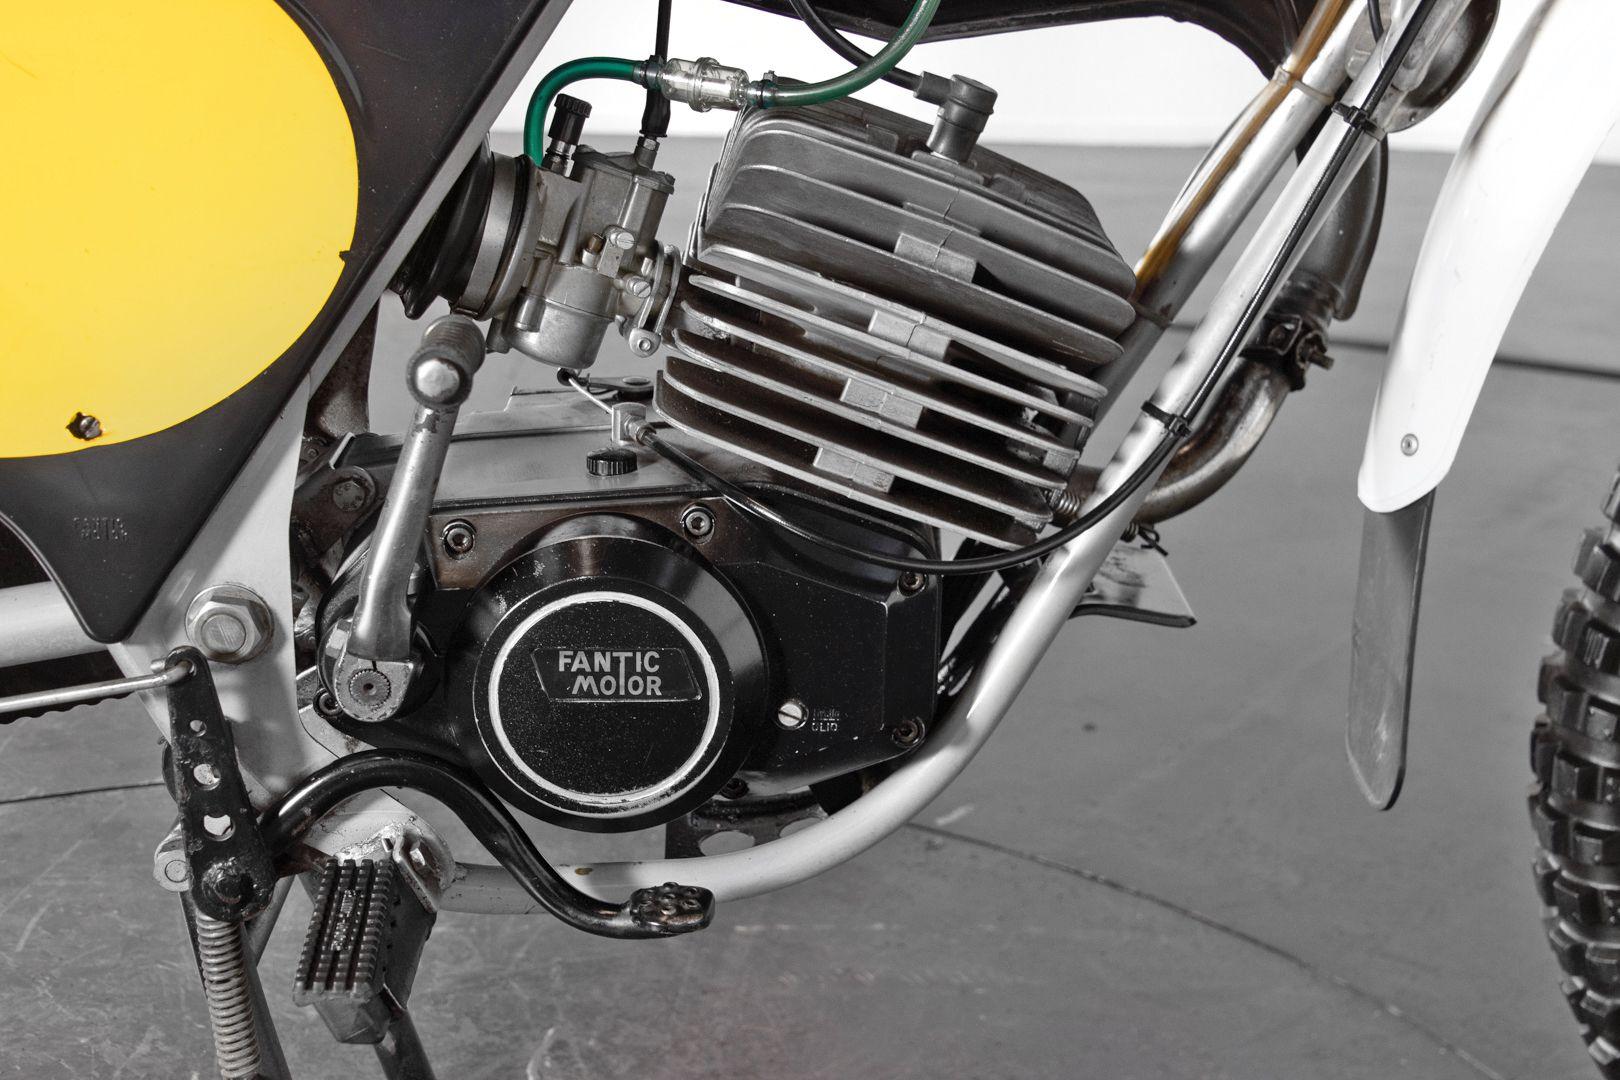 1975 FANTIC MOTOR TX 190 49953